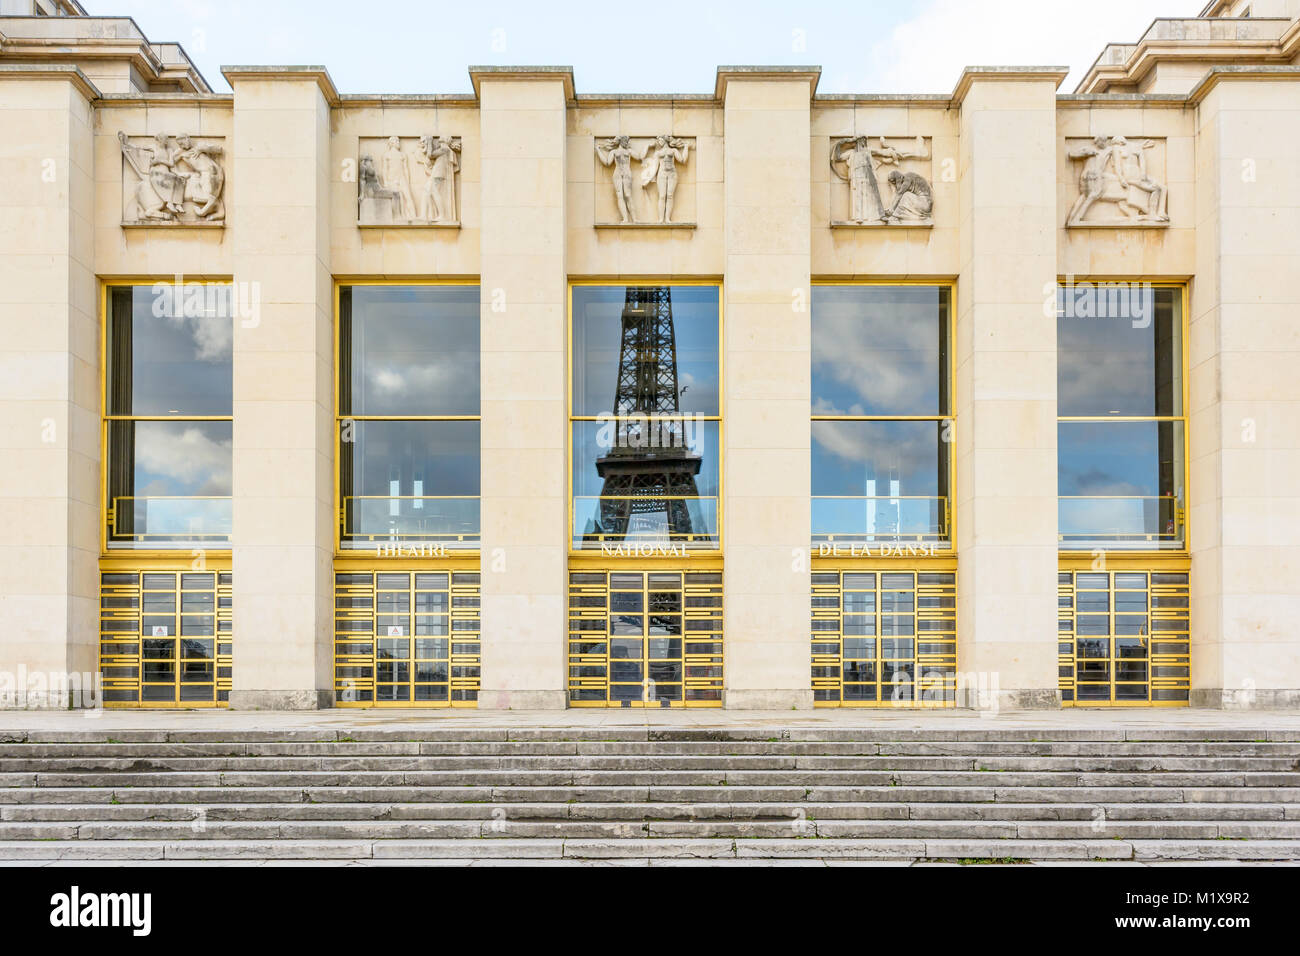 Grand Foyer Chaillot : Art deco architecture france stock photos